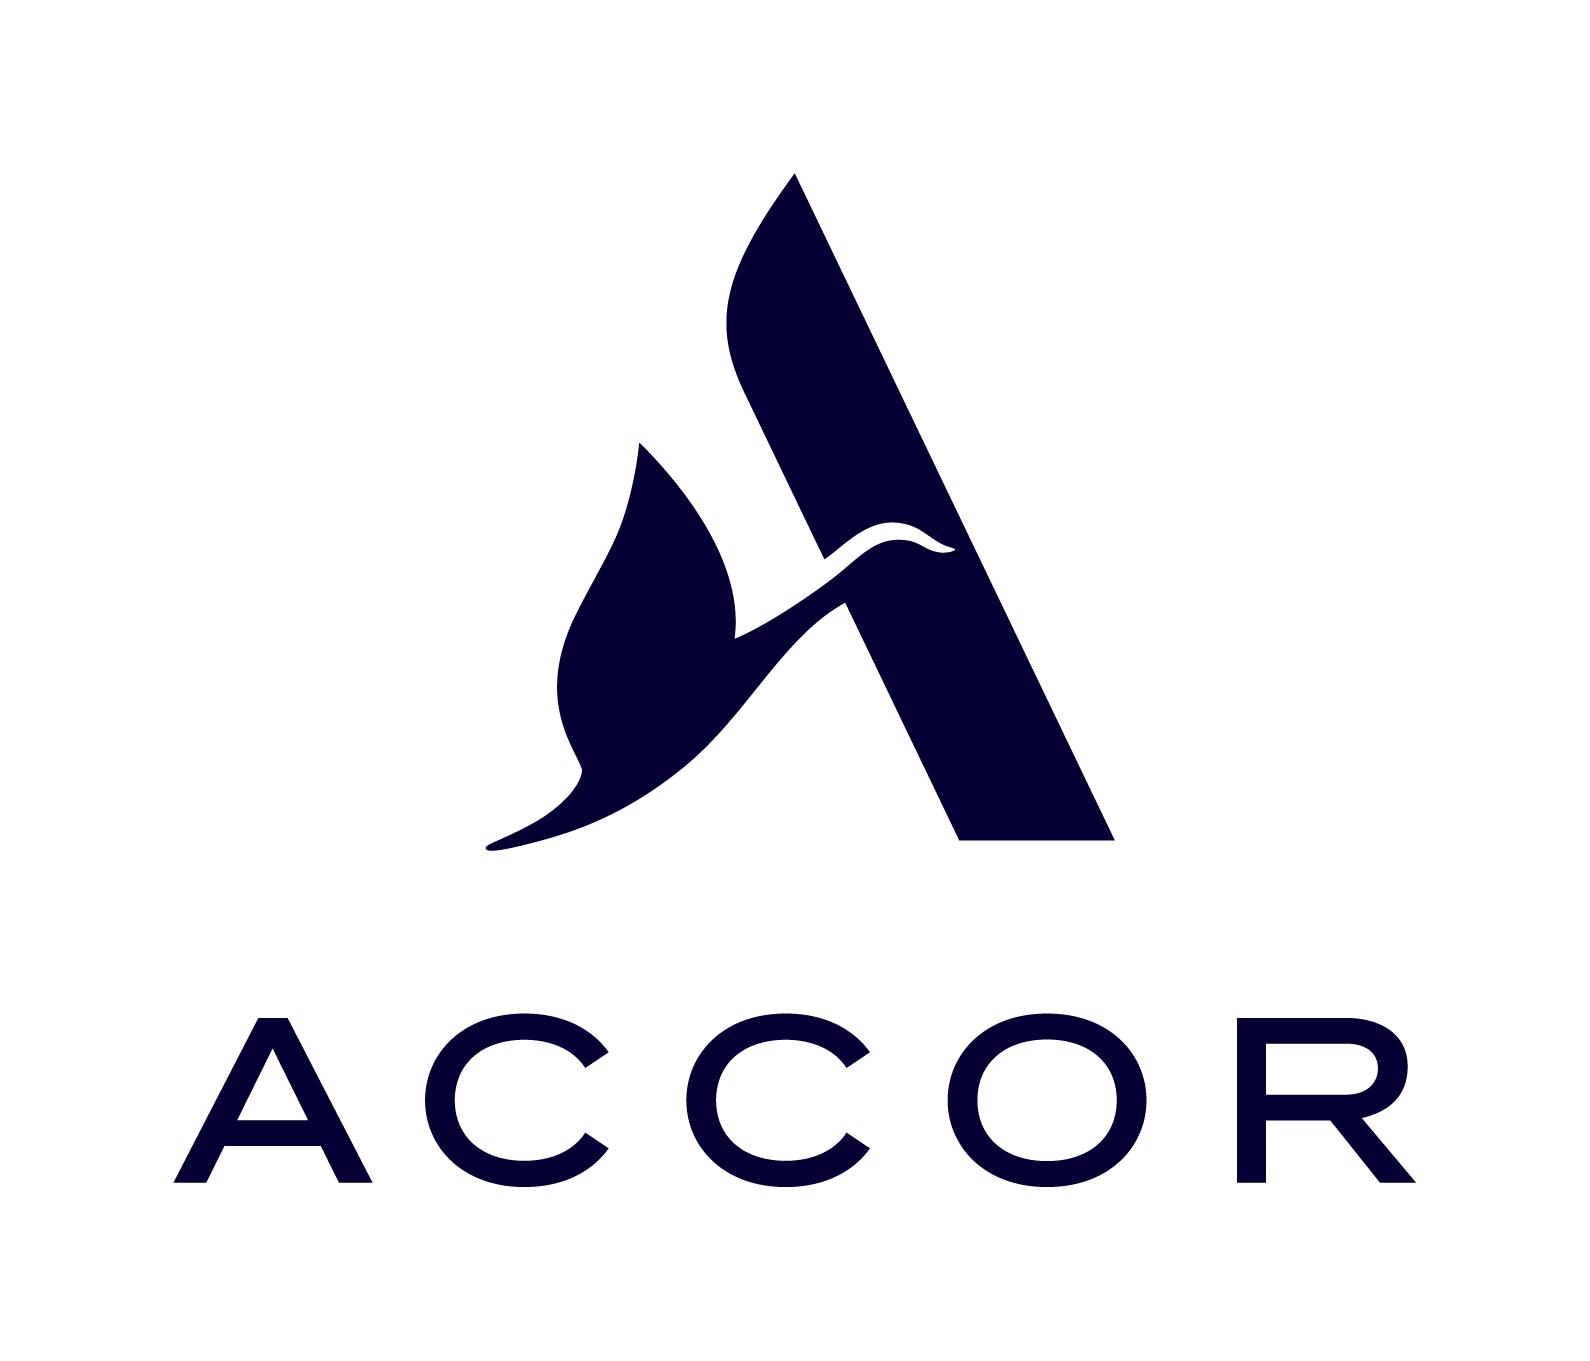 Accor_logo_Dark blue_RVB